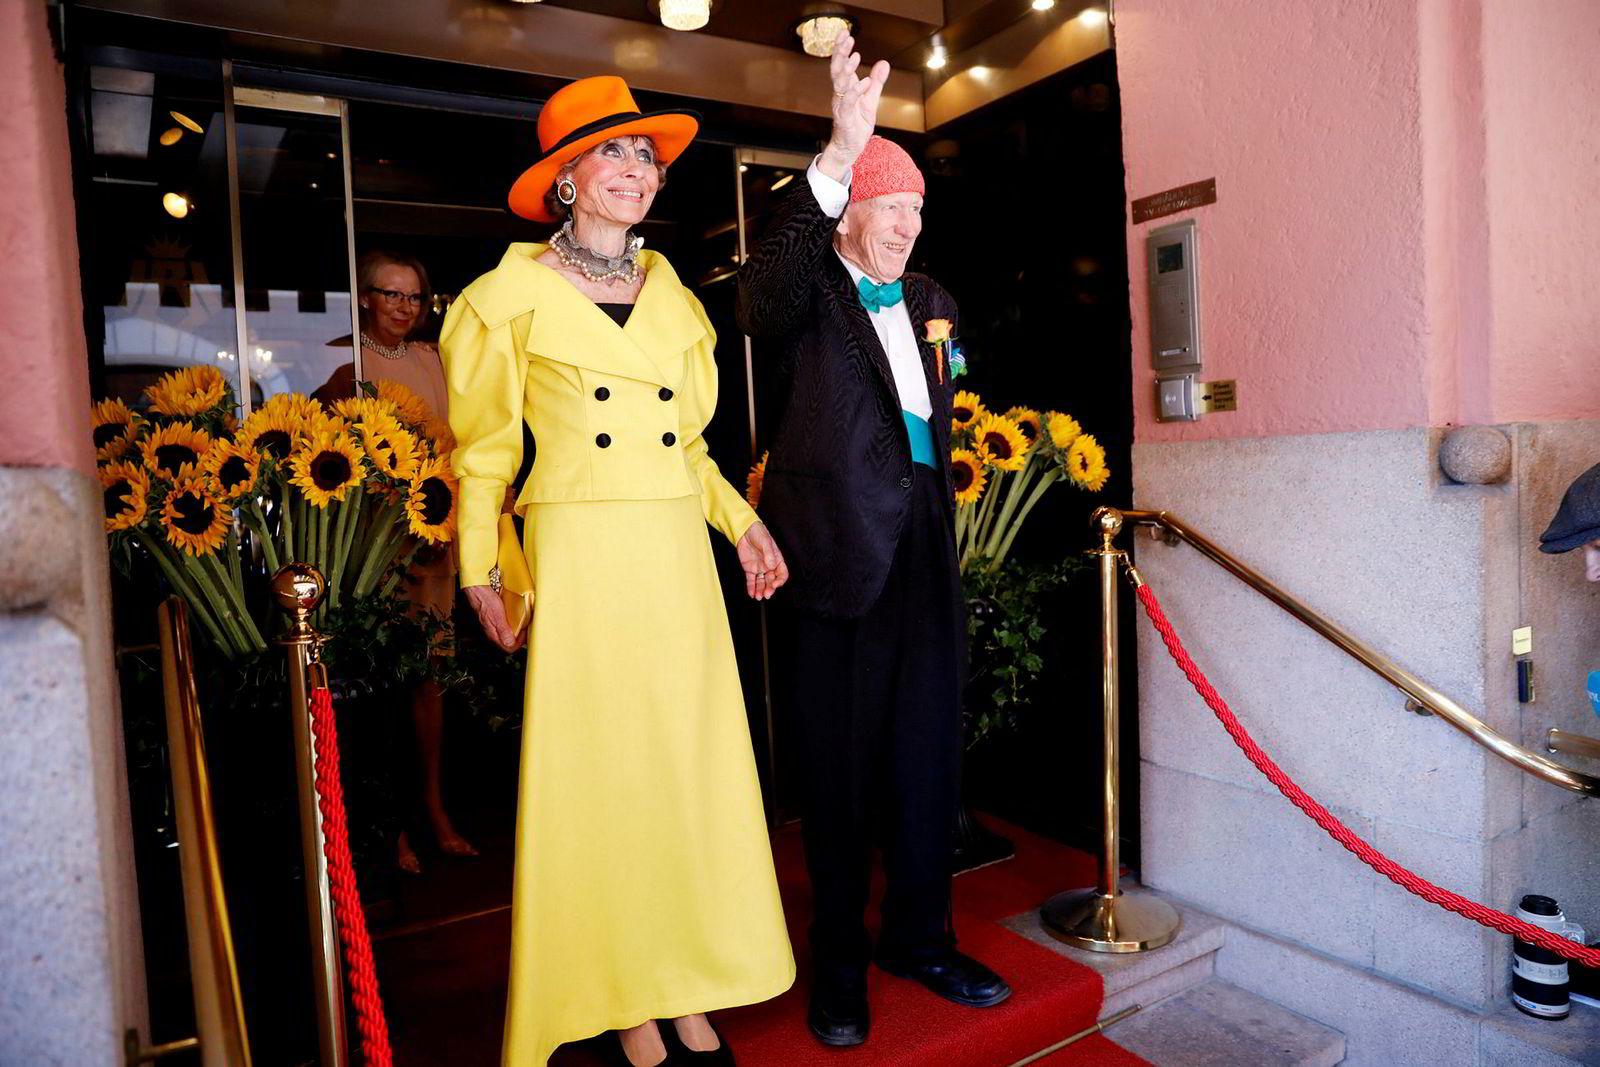 Sissel Berdal Haga og Olav Thon giftet seg på Hotel Bristol i Oslo fredag formiddag. ---